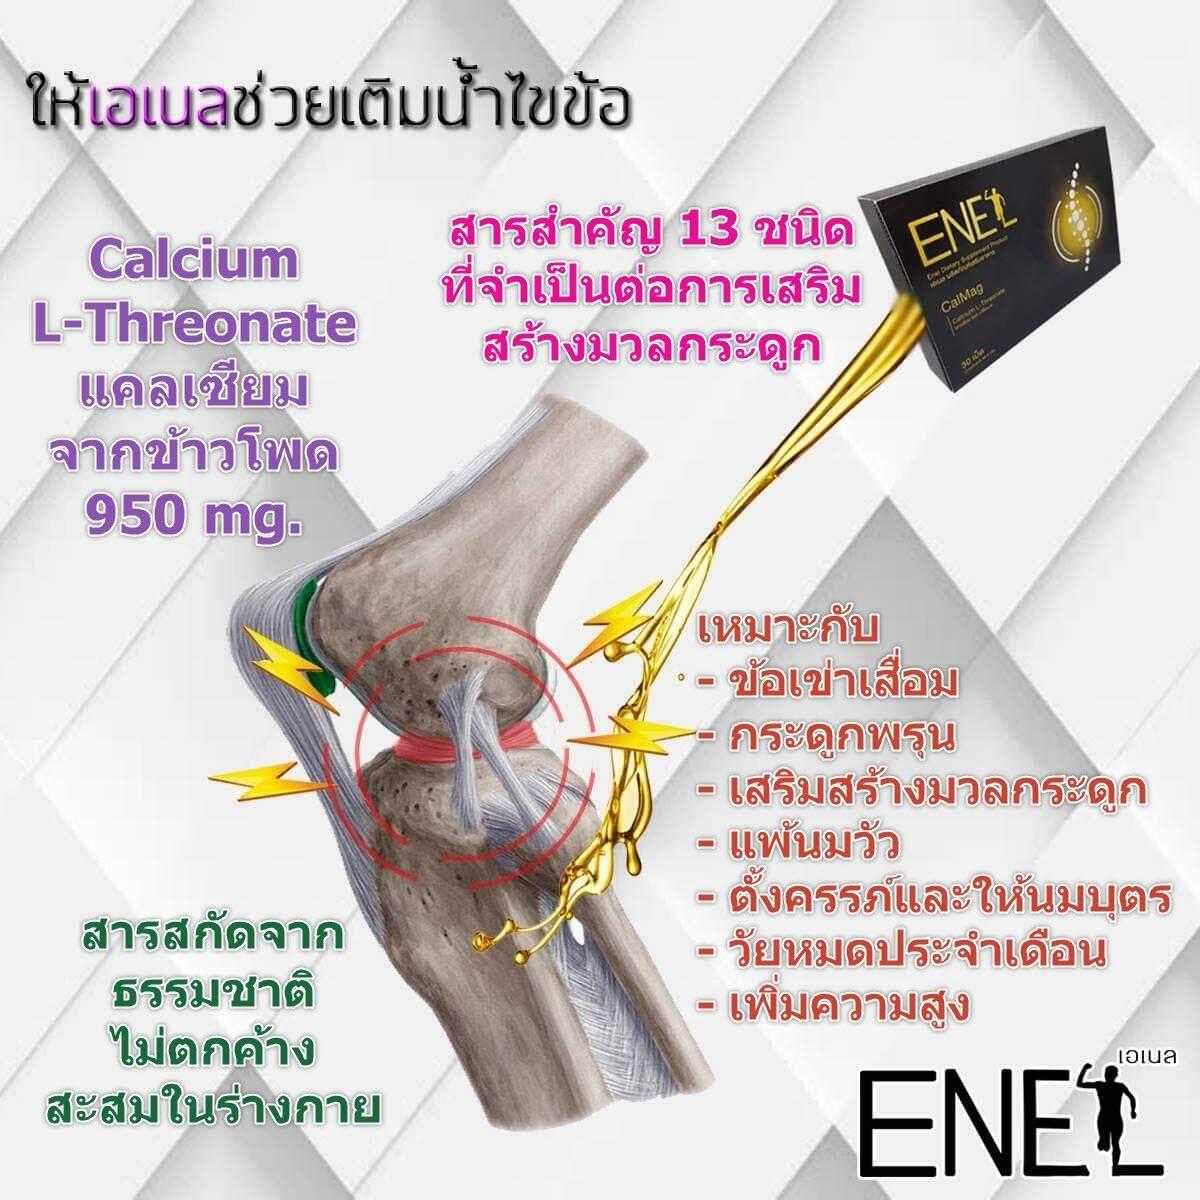 Enel Calmag (เอเนล แคลแม็ก) อาหารเสริมบำรุงกระดูกและข้อ แคลเซียม แอลทรีโอเนต (calcium L-Threonate) 950 Mg แคลเซียมจากข้าวโพด.